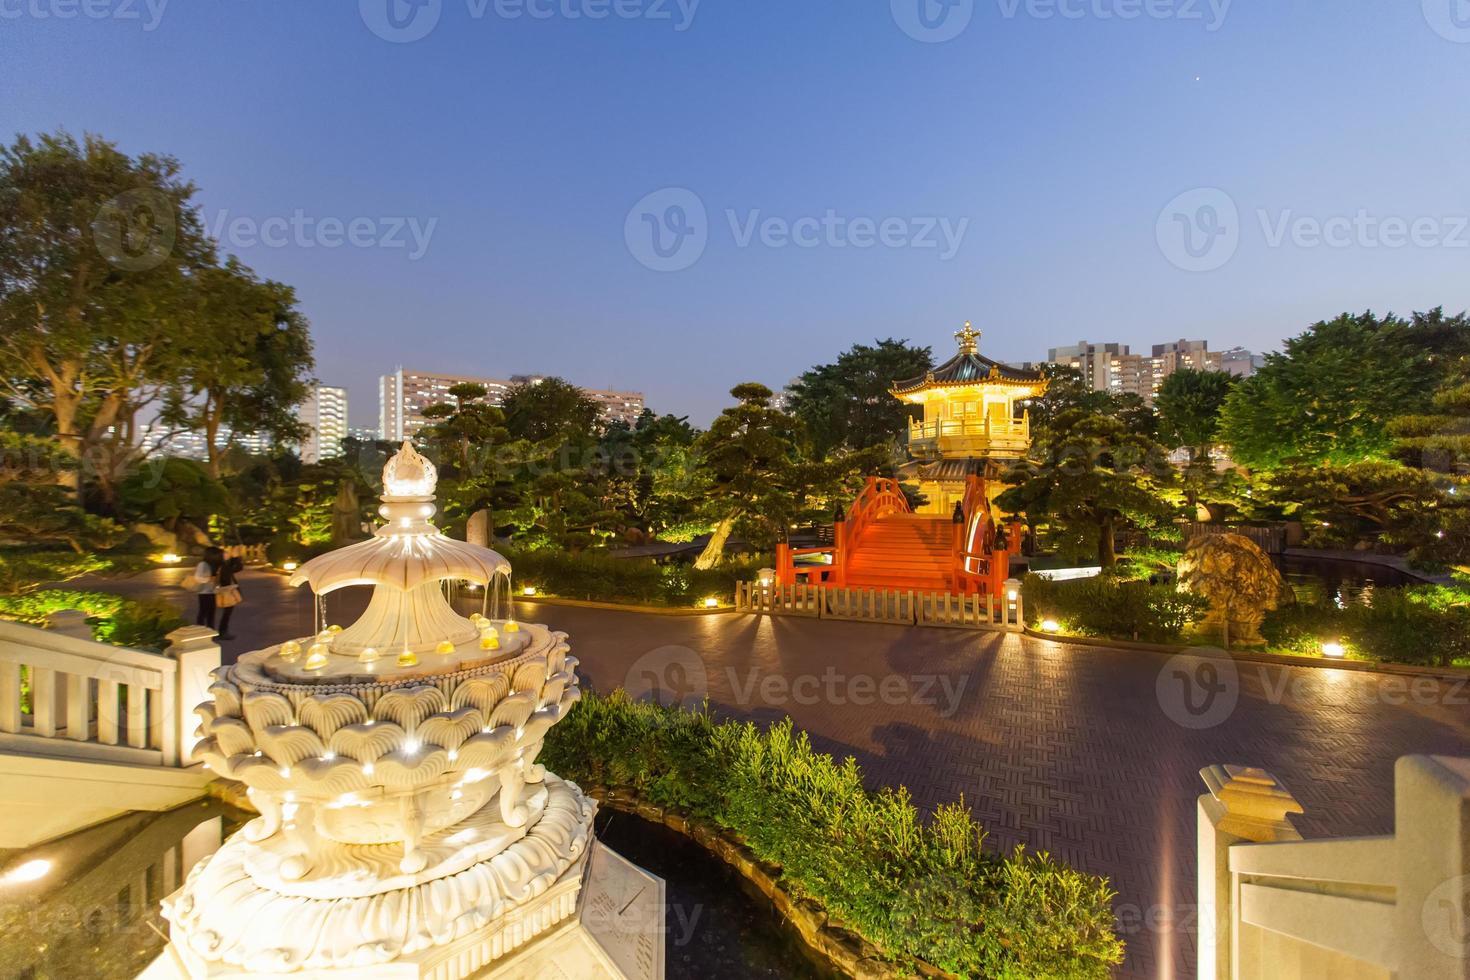 pagoda e ponte rosso in giardino cinese foto